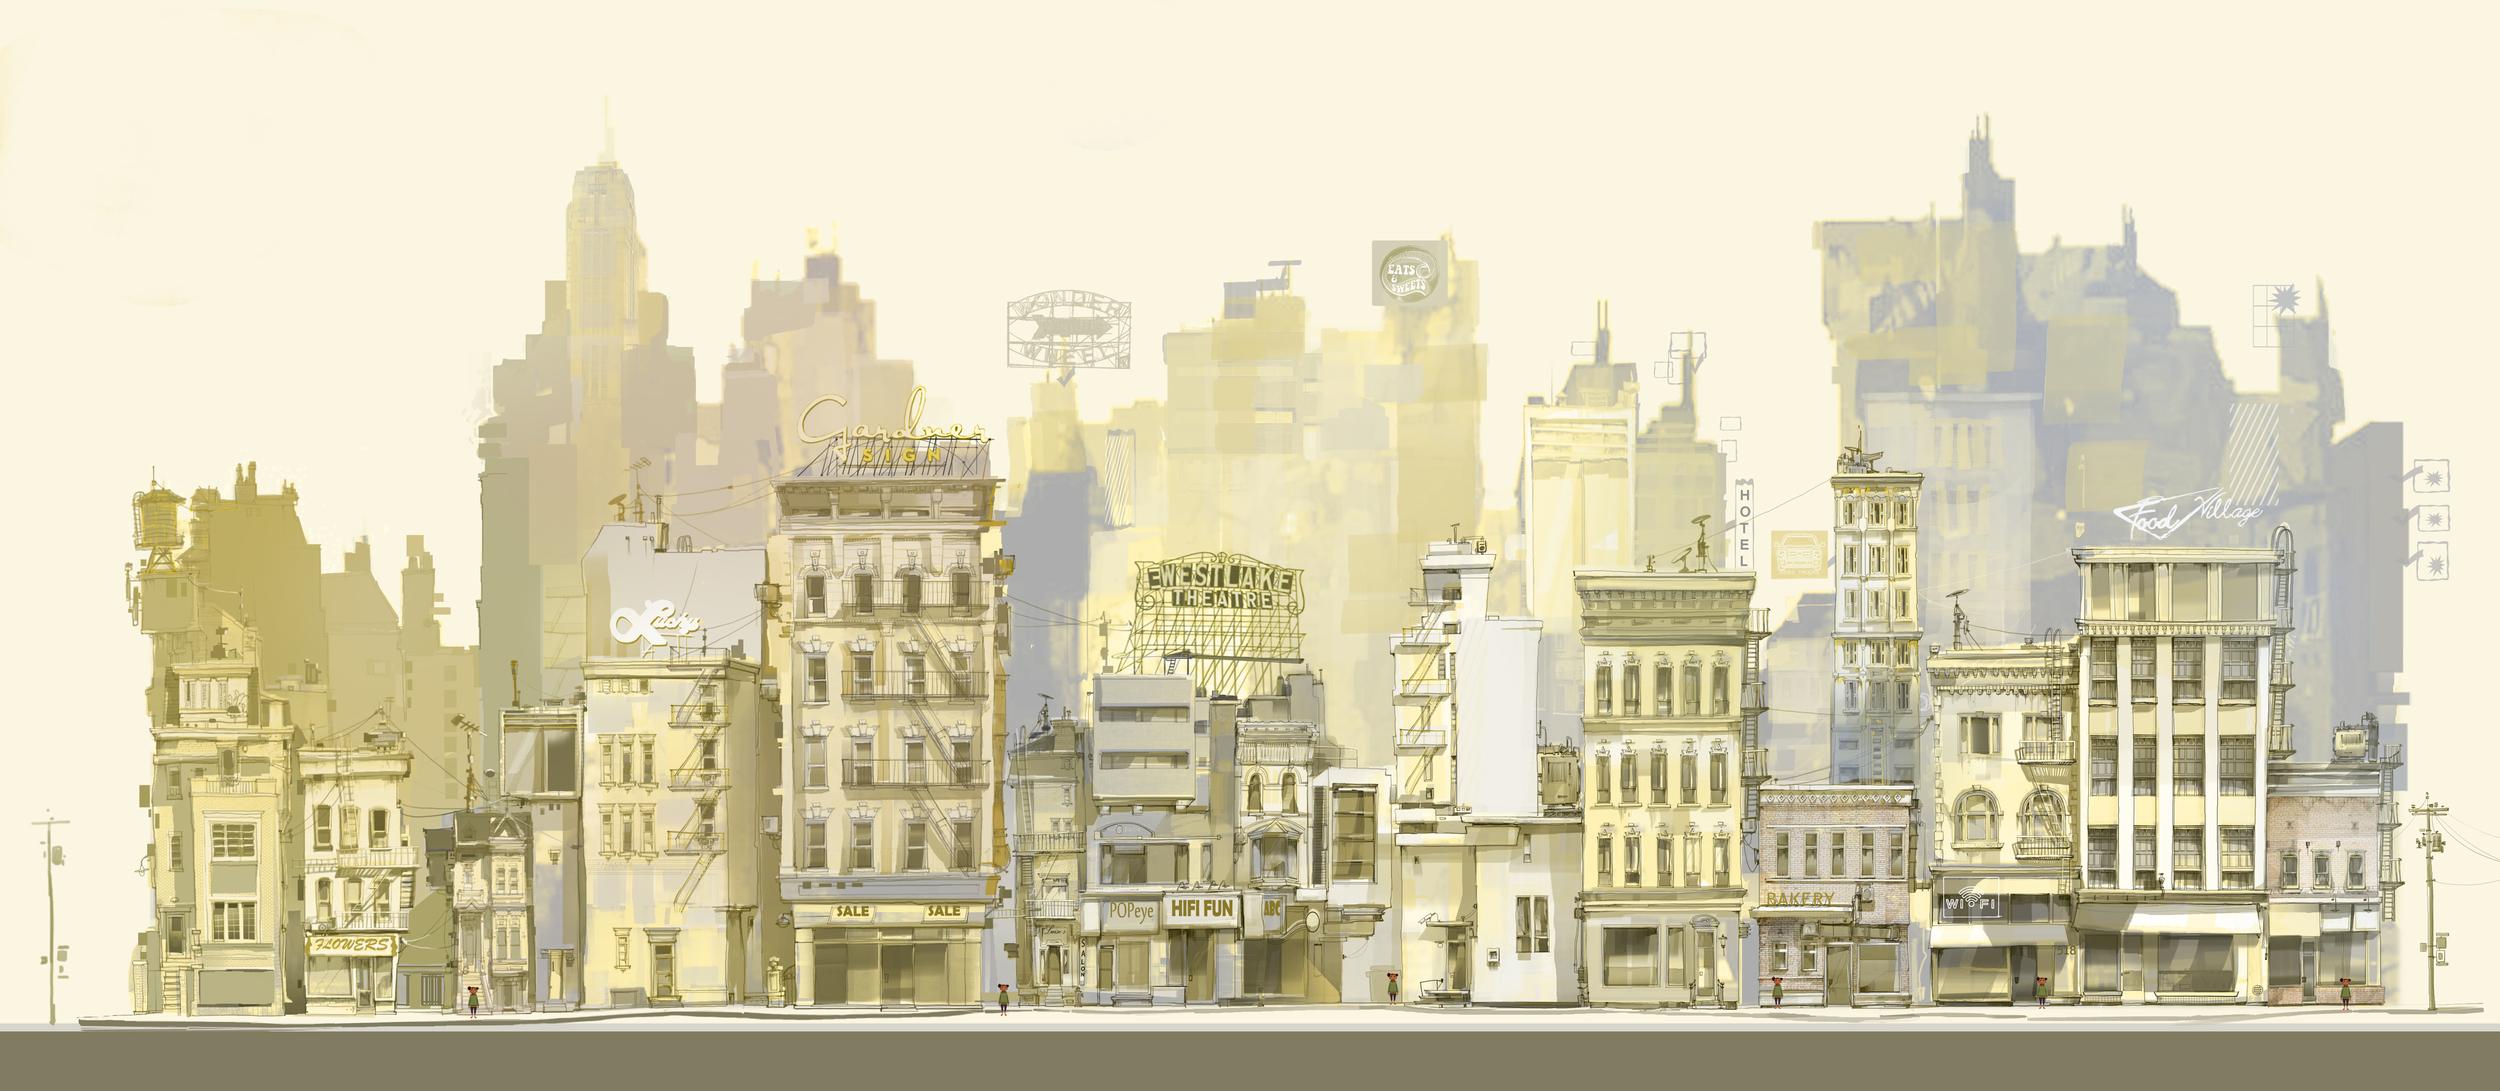 Concept Art from art director Emil Mitev